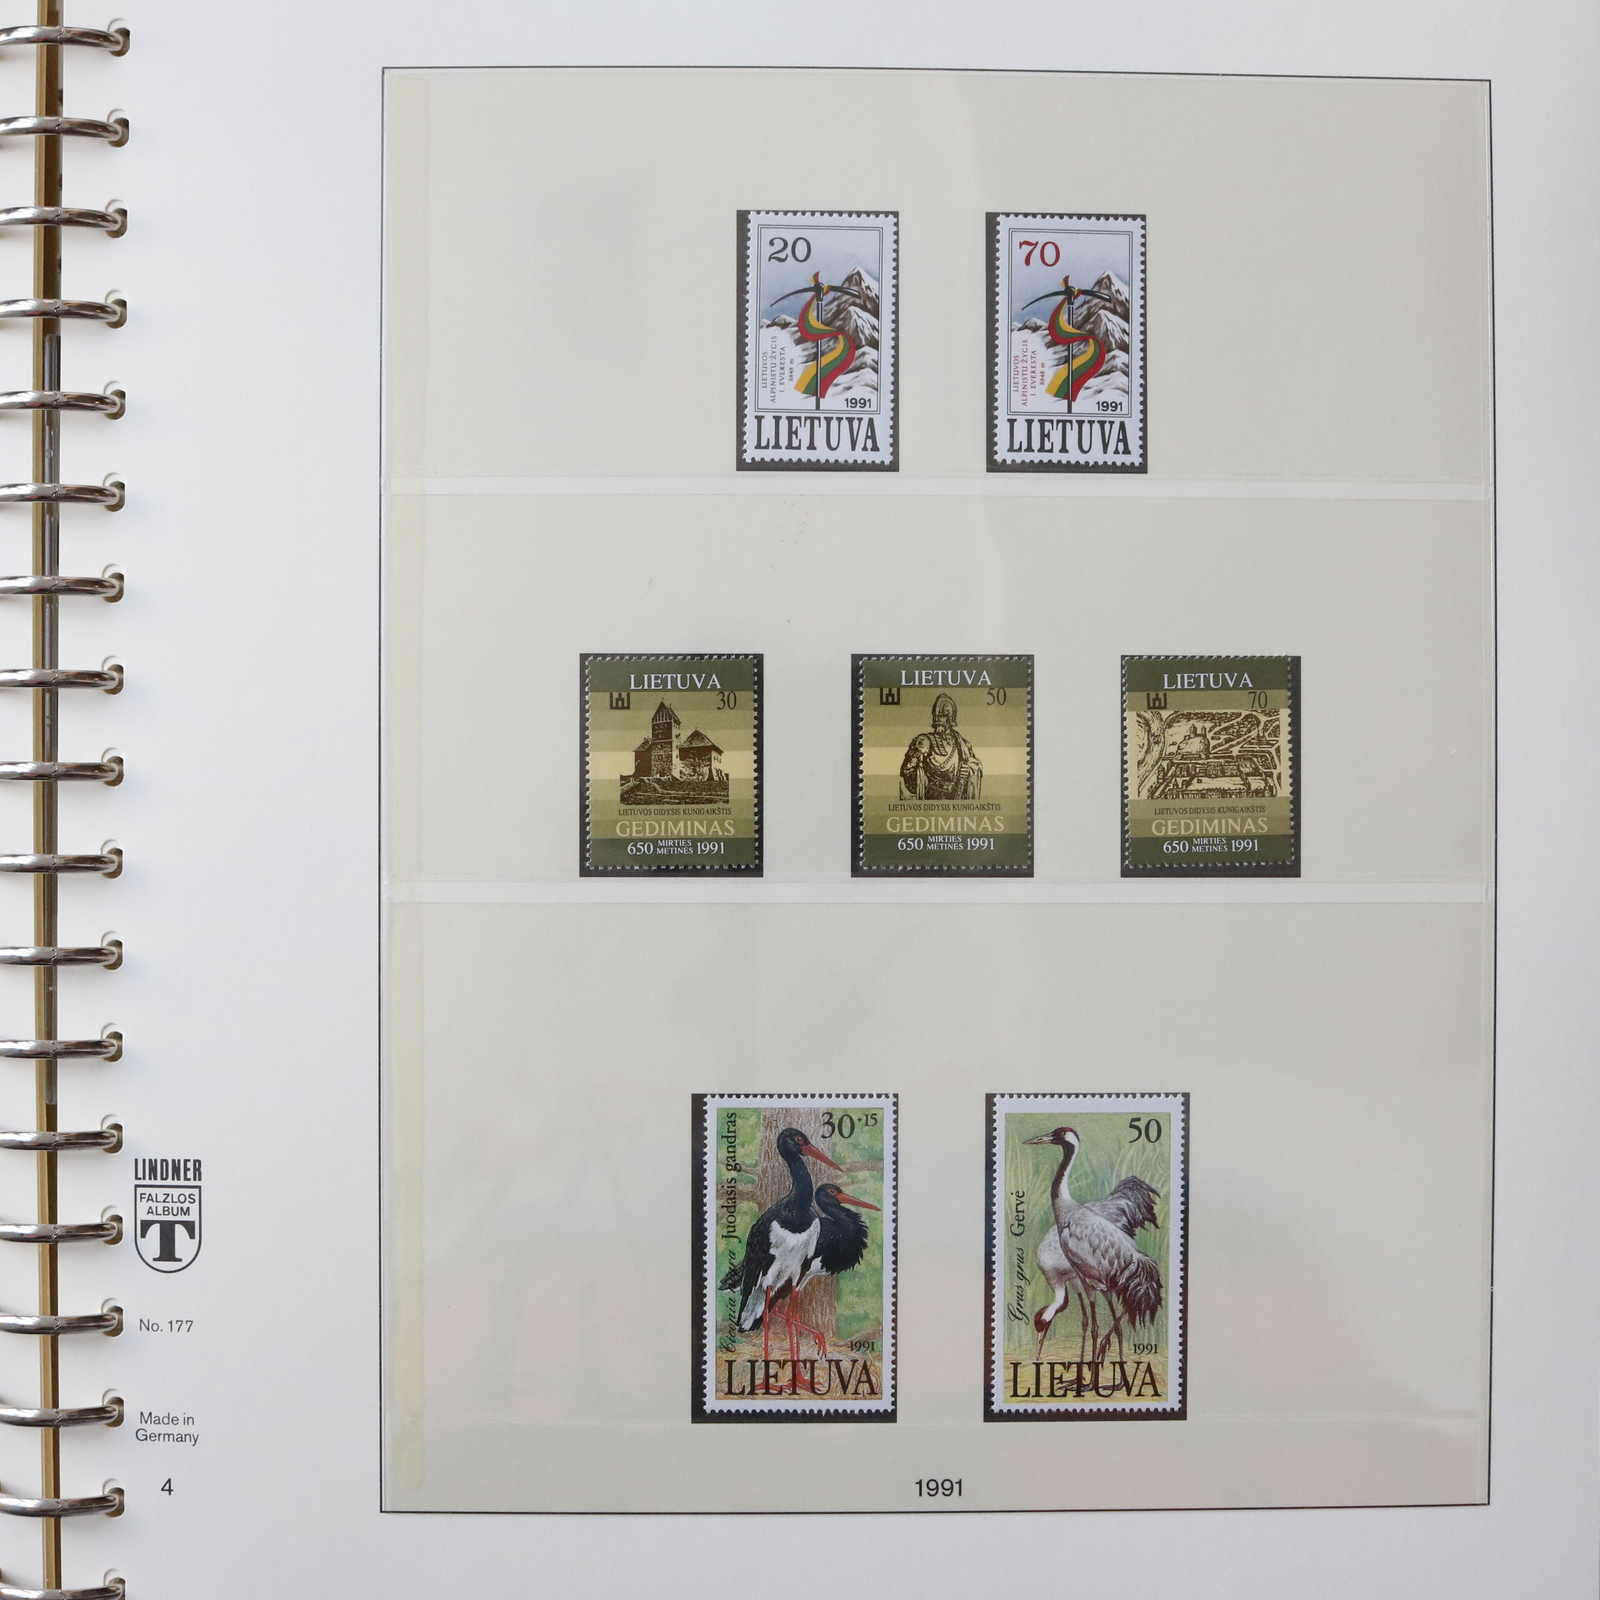 Lot 769 - Collections Louis Nicollin Lithuania -  Auktionshaus Schlegel 26 Public Auction